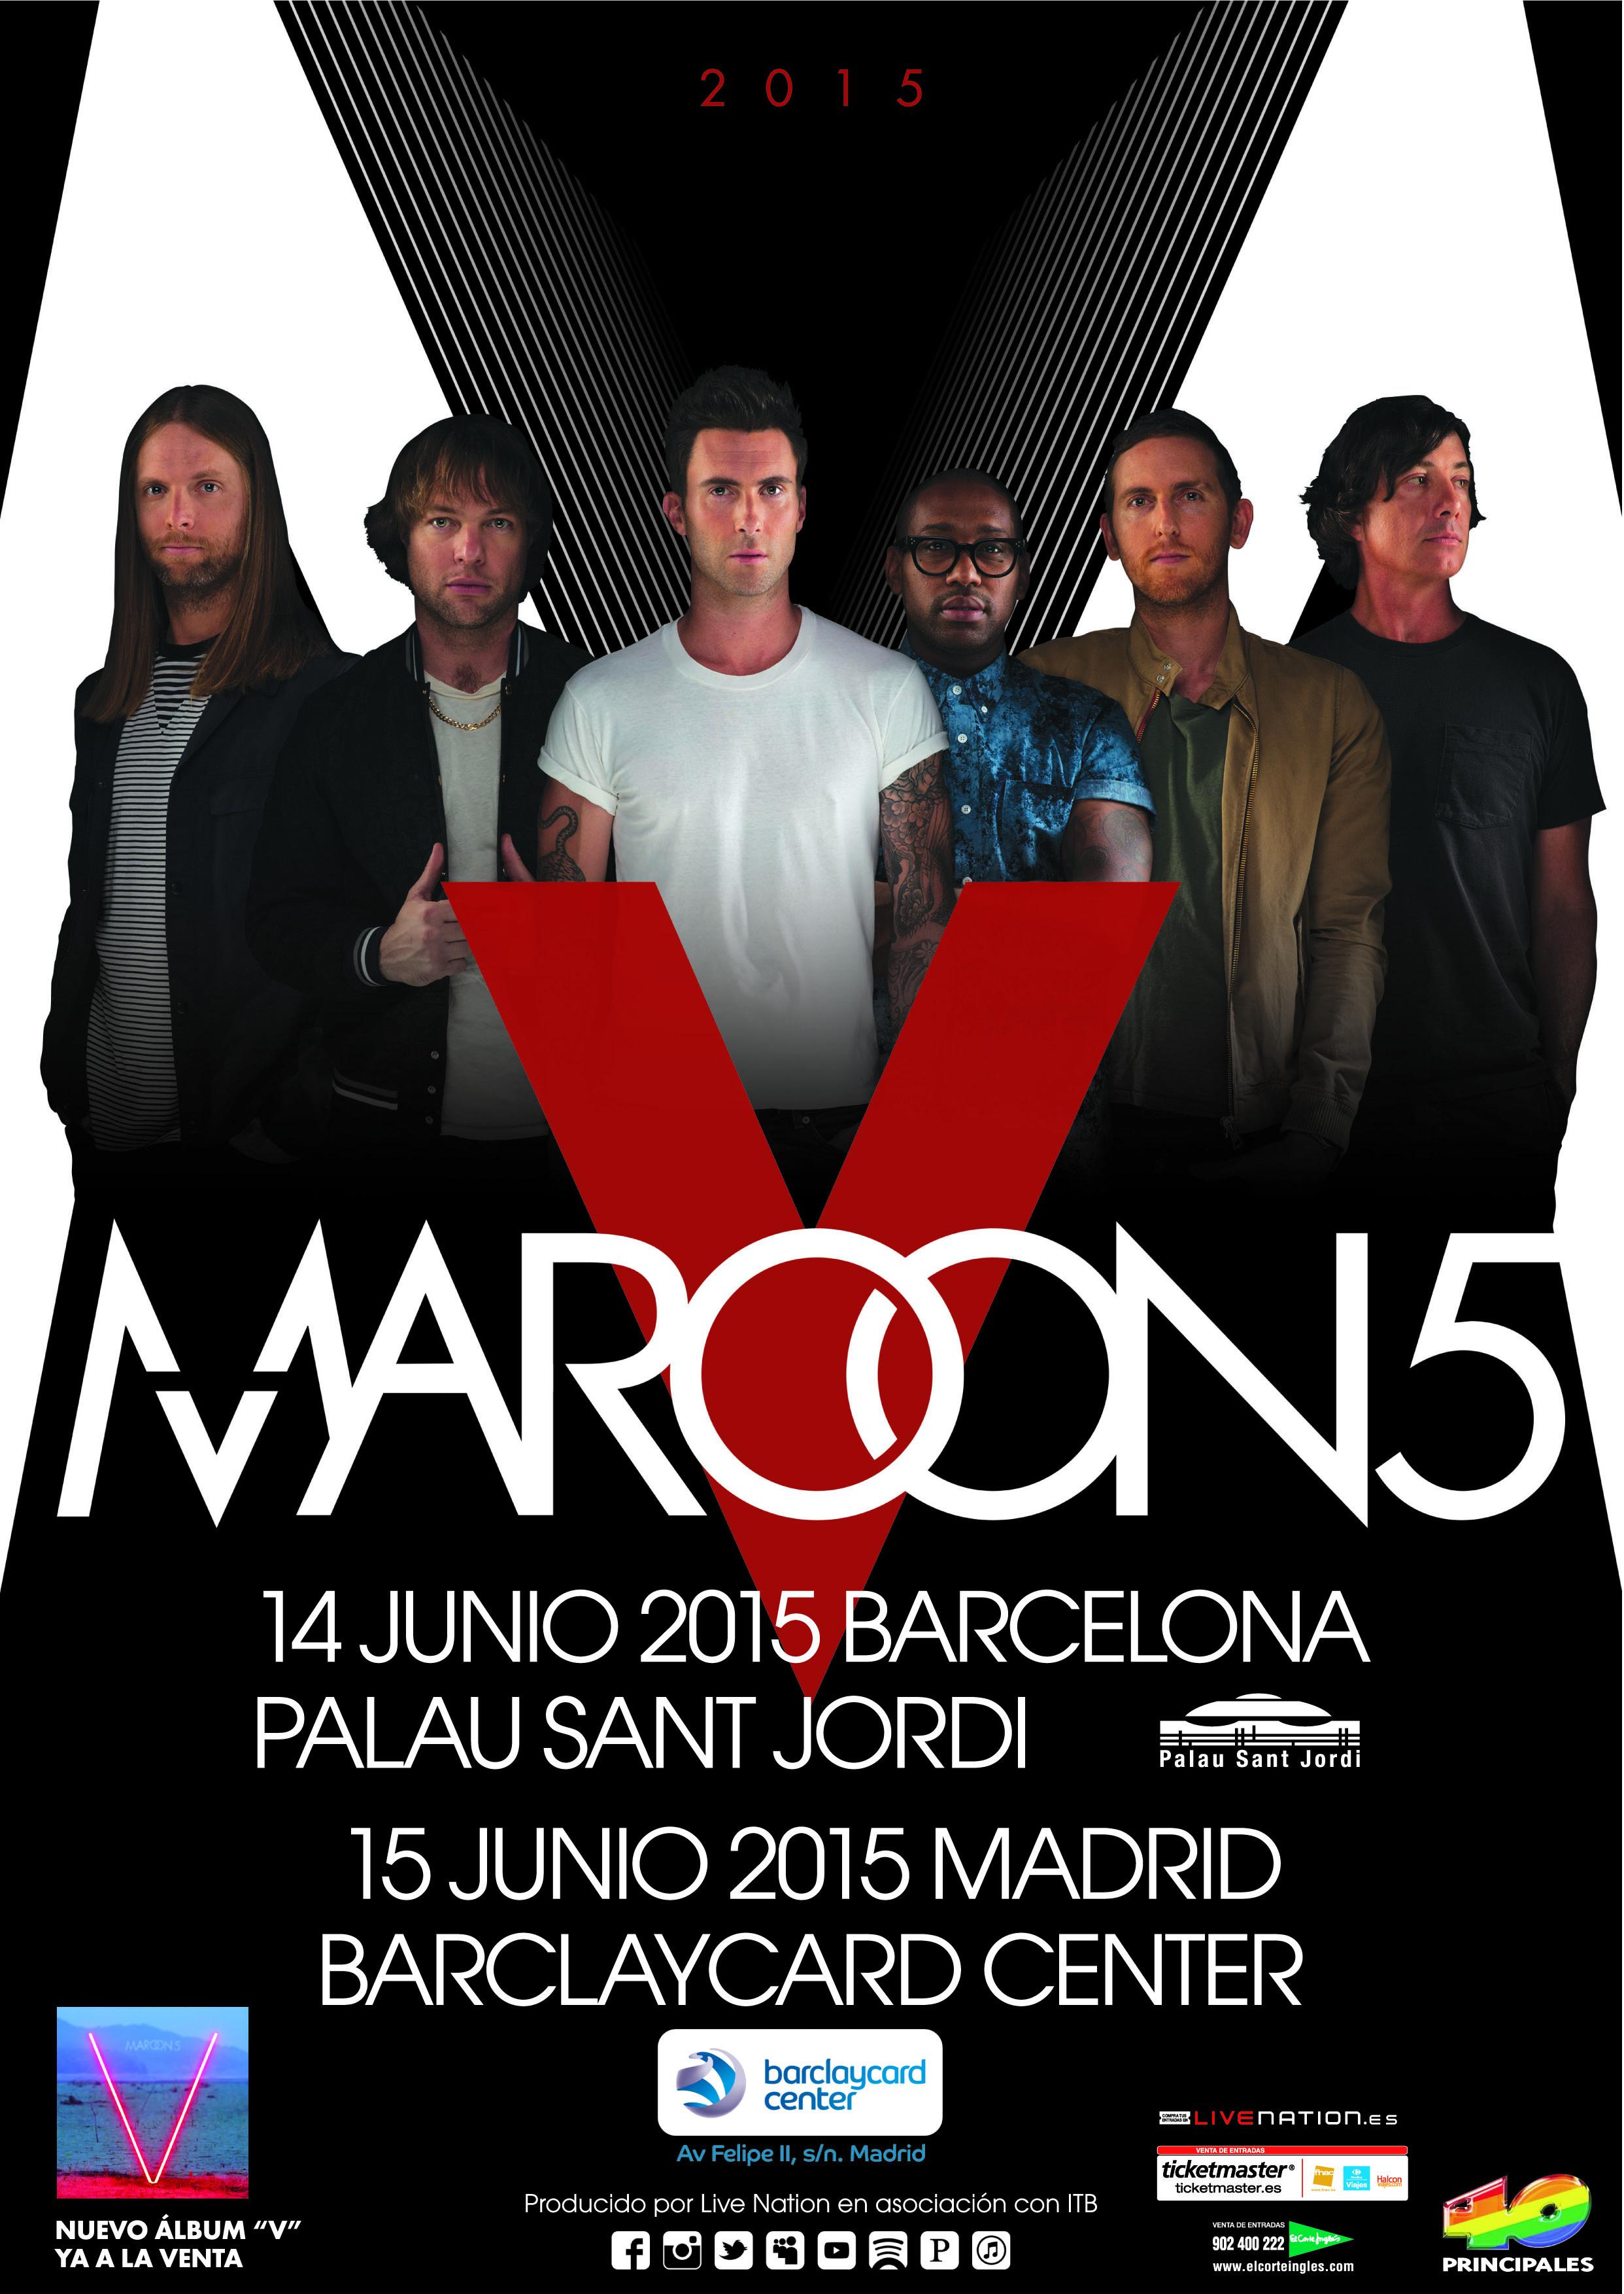 exc_Maroon5.jpeg